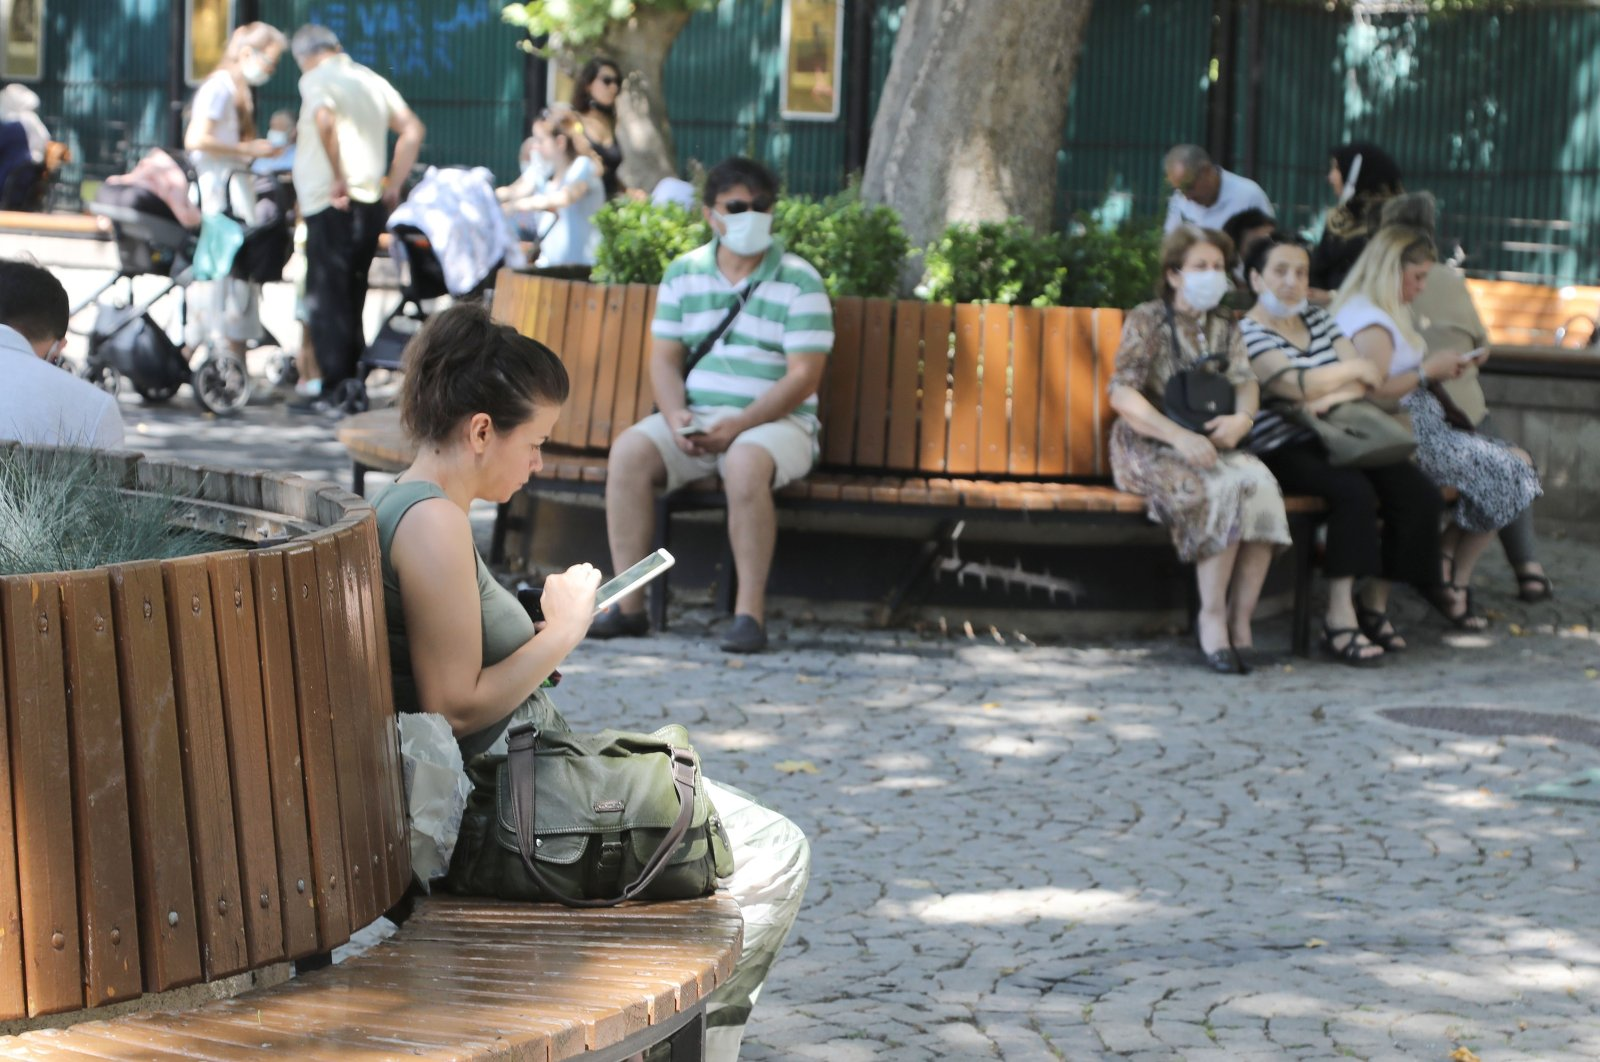 A woman checks her tablet computer at a park in Çankaya district, in the capital Ankara, Turkey, Aug. 26, 2021. (IHA Photo)